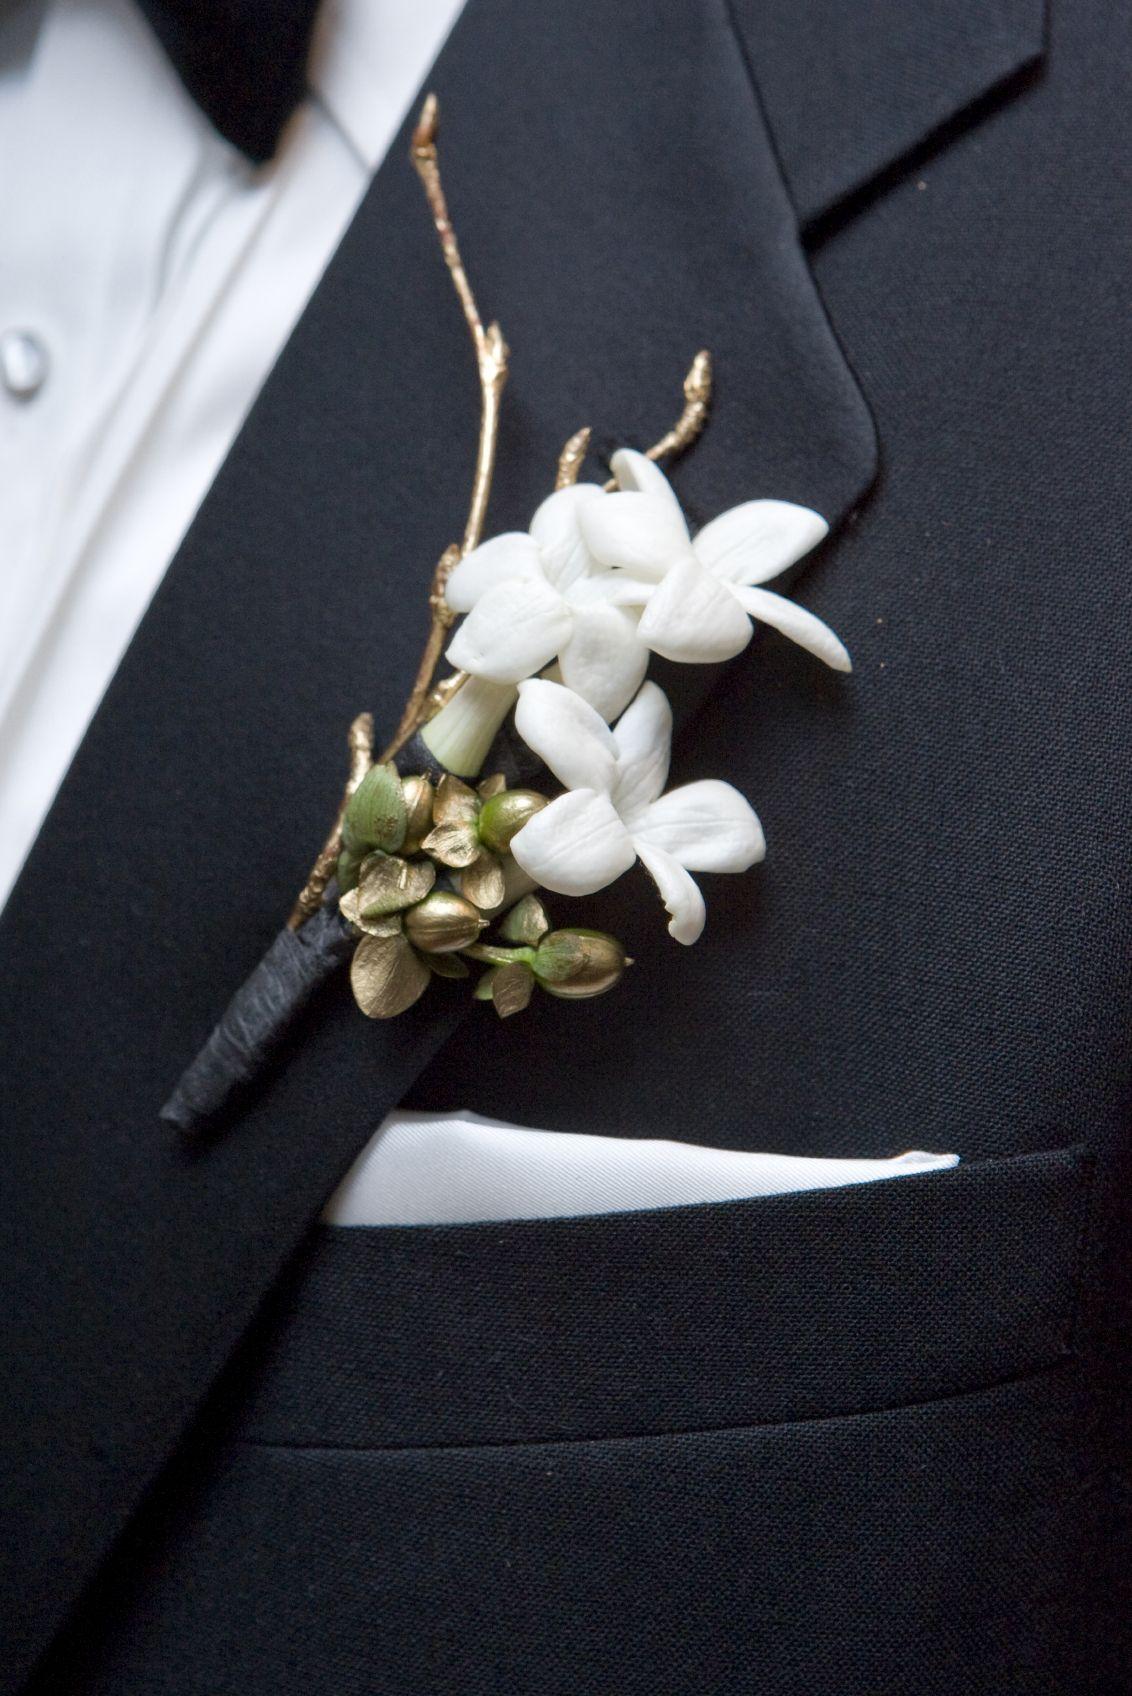 Weddings Boutonniere Wedding Wedding Handkerchief Bride Groom Boutonniere